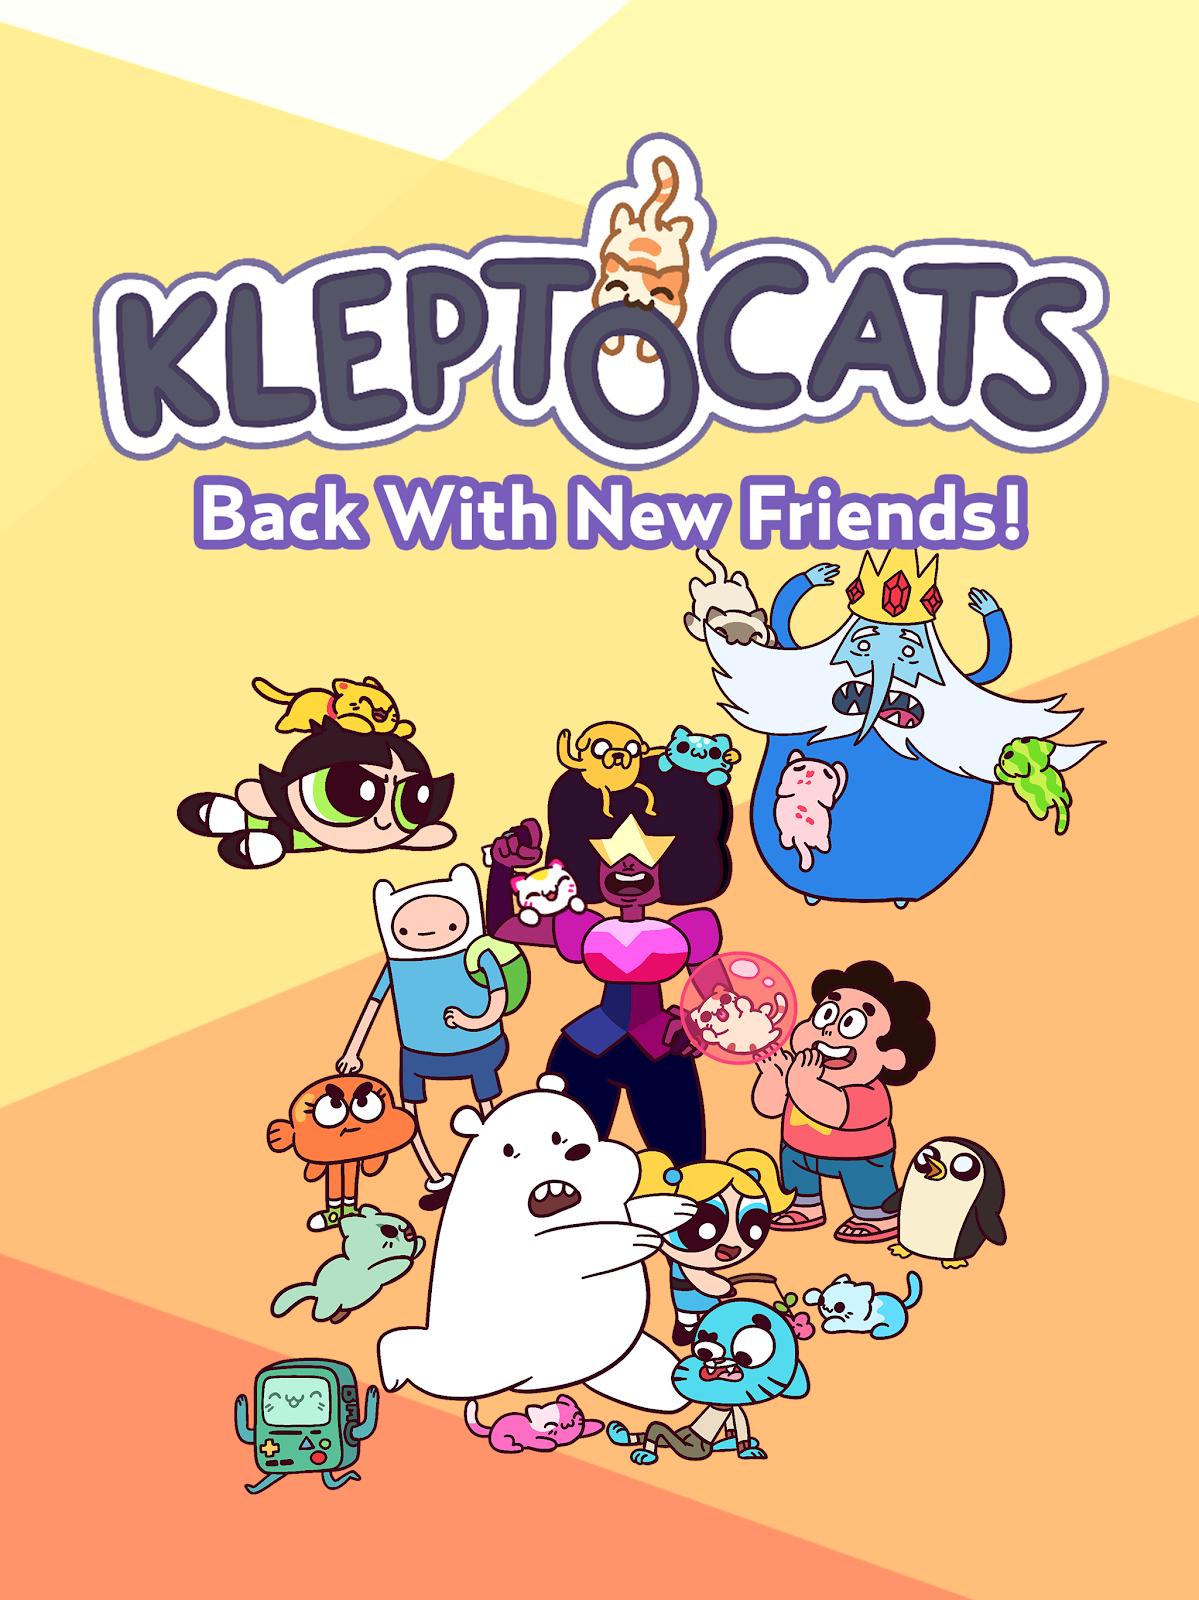 KleptoCats y Cartoon Network